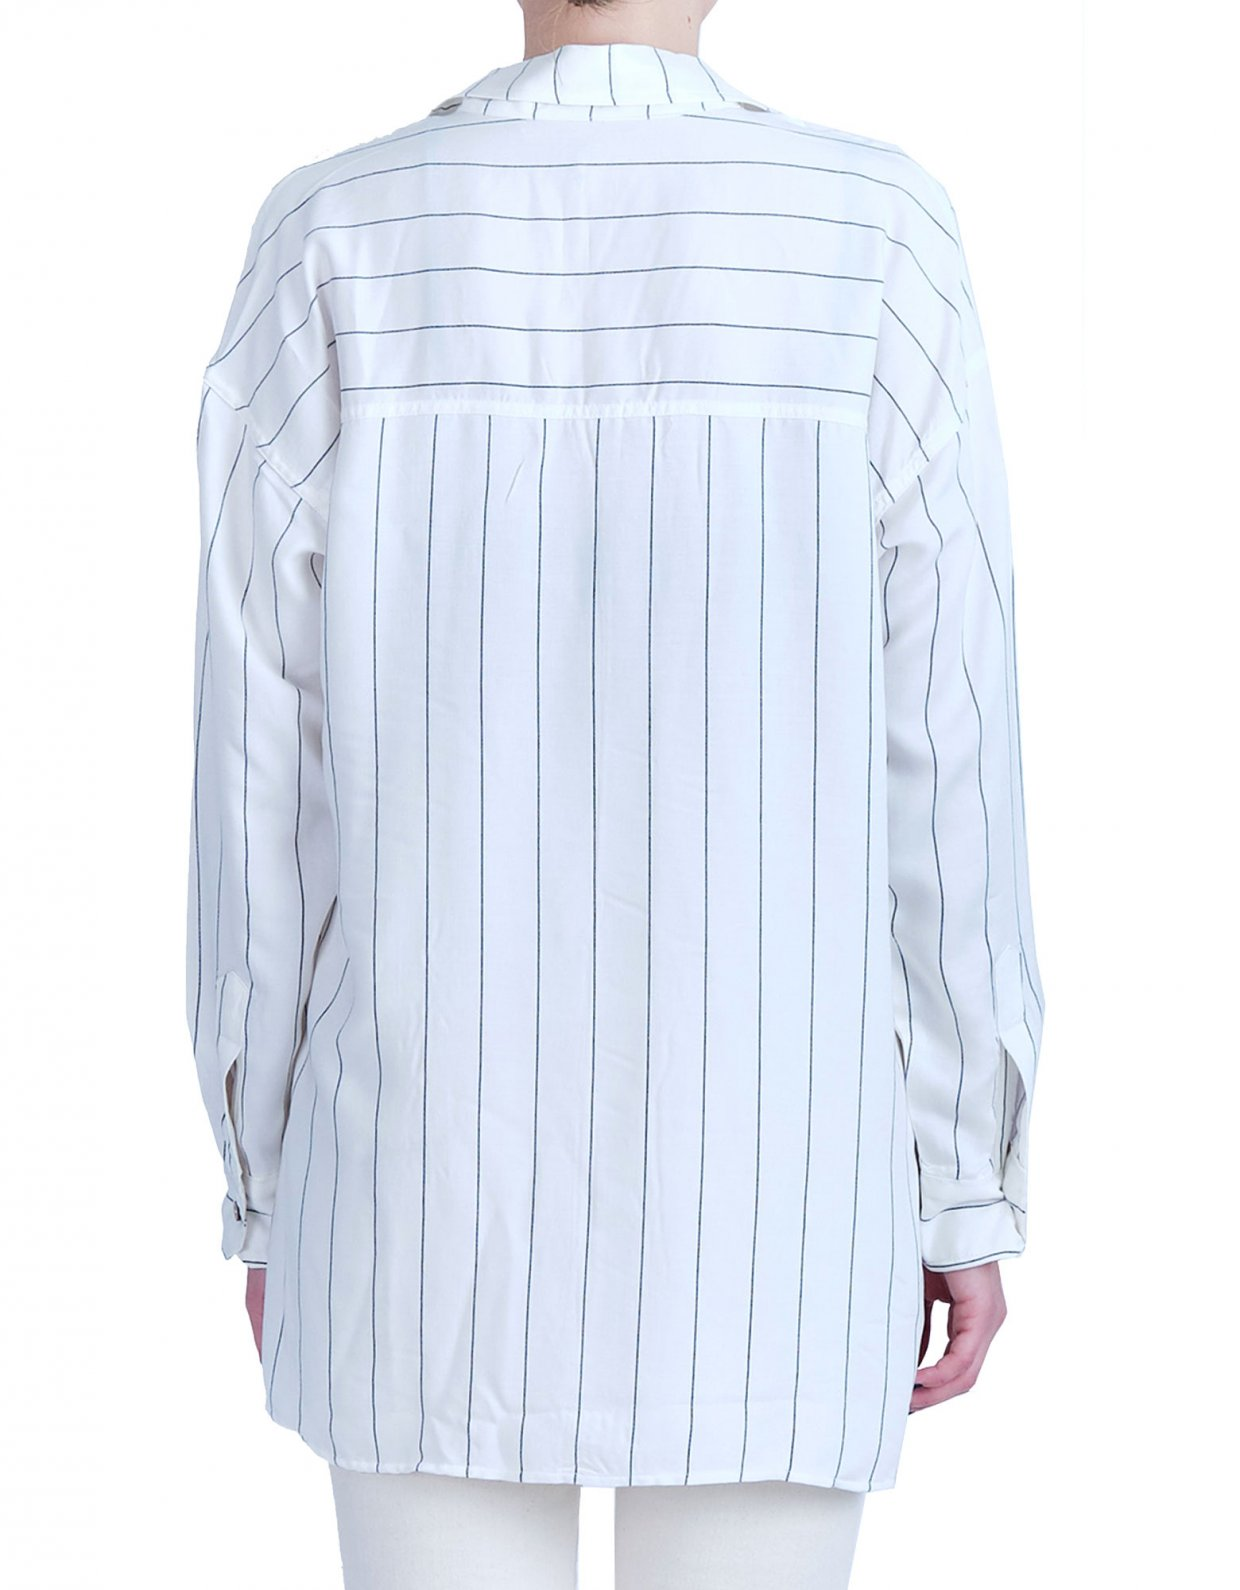 Salt & Pepper Stella striped shirt